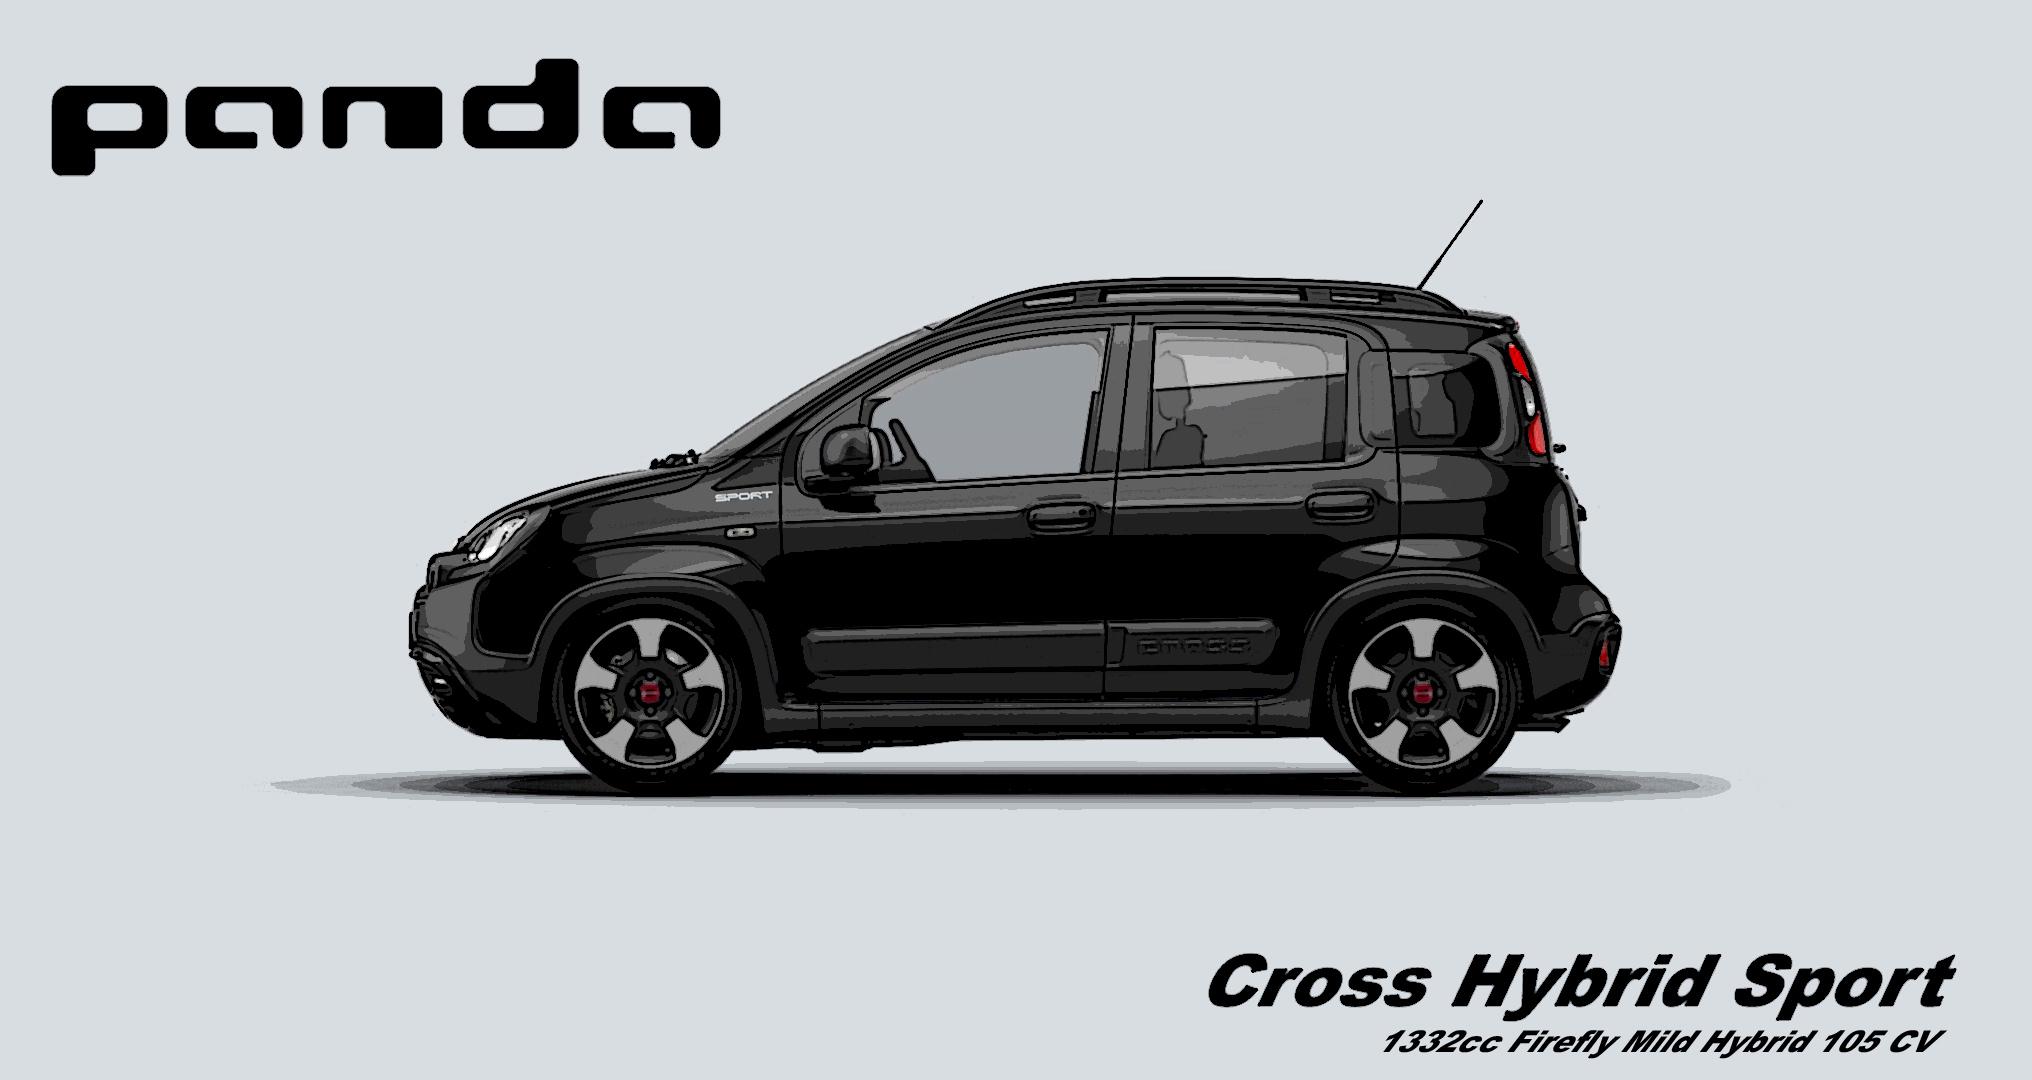 Click image for larger version  Name:FIAT Panda Cross 1332cc Hybrid Sport.jpeg Views:14 Size:337.4 KB ID:209310